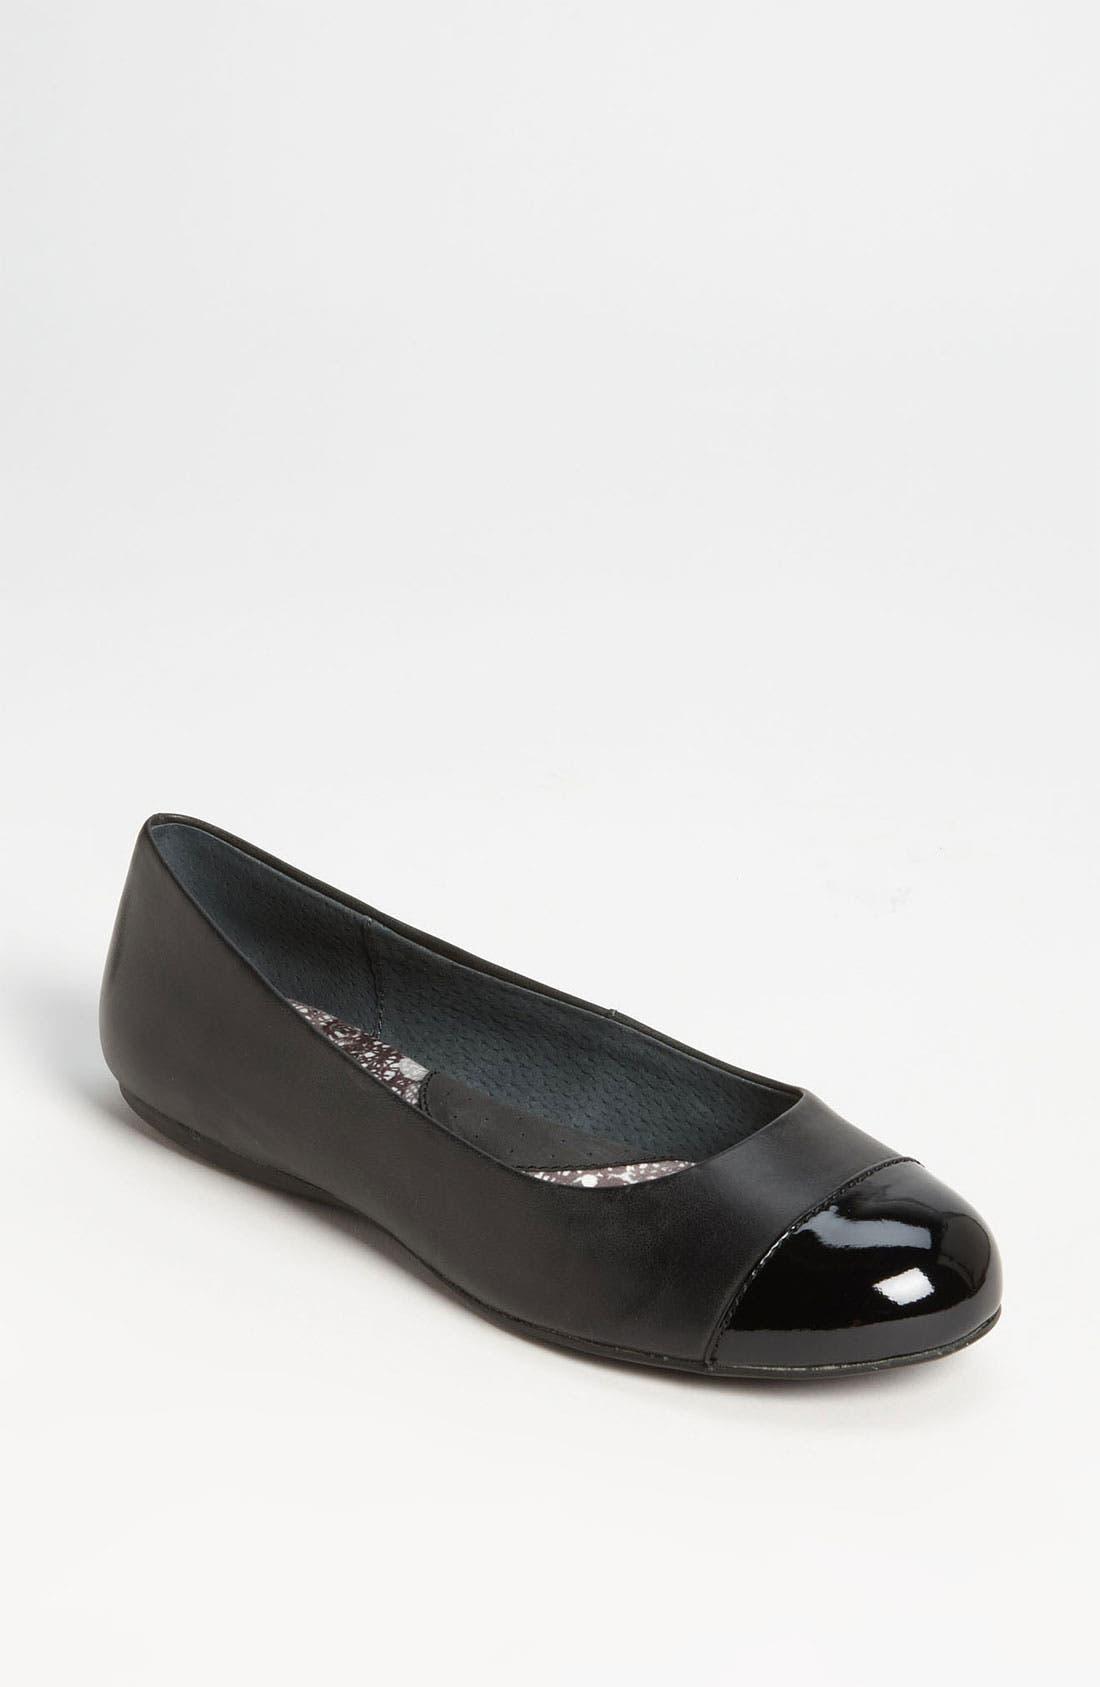 SOFTWALK<SUP>®</SUP> 'Napa' Flat, Main, color, BLACK LEATHER